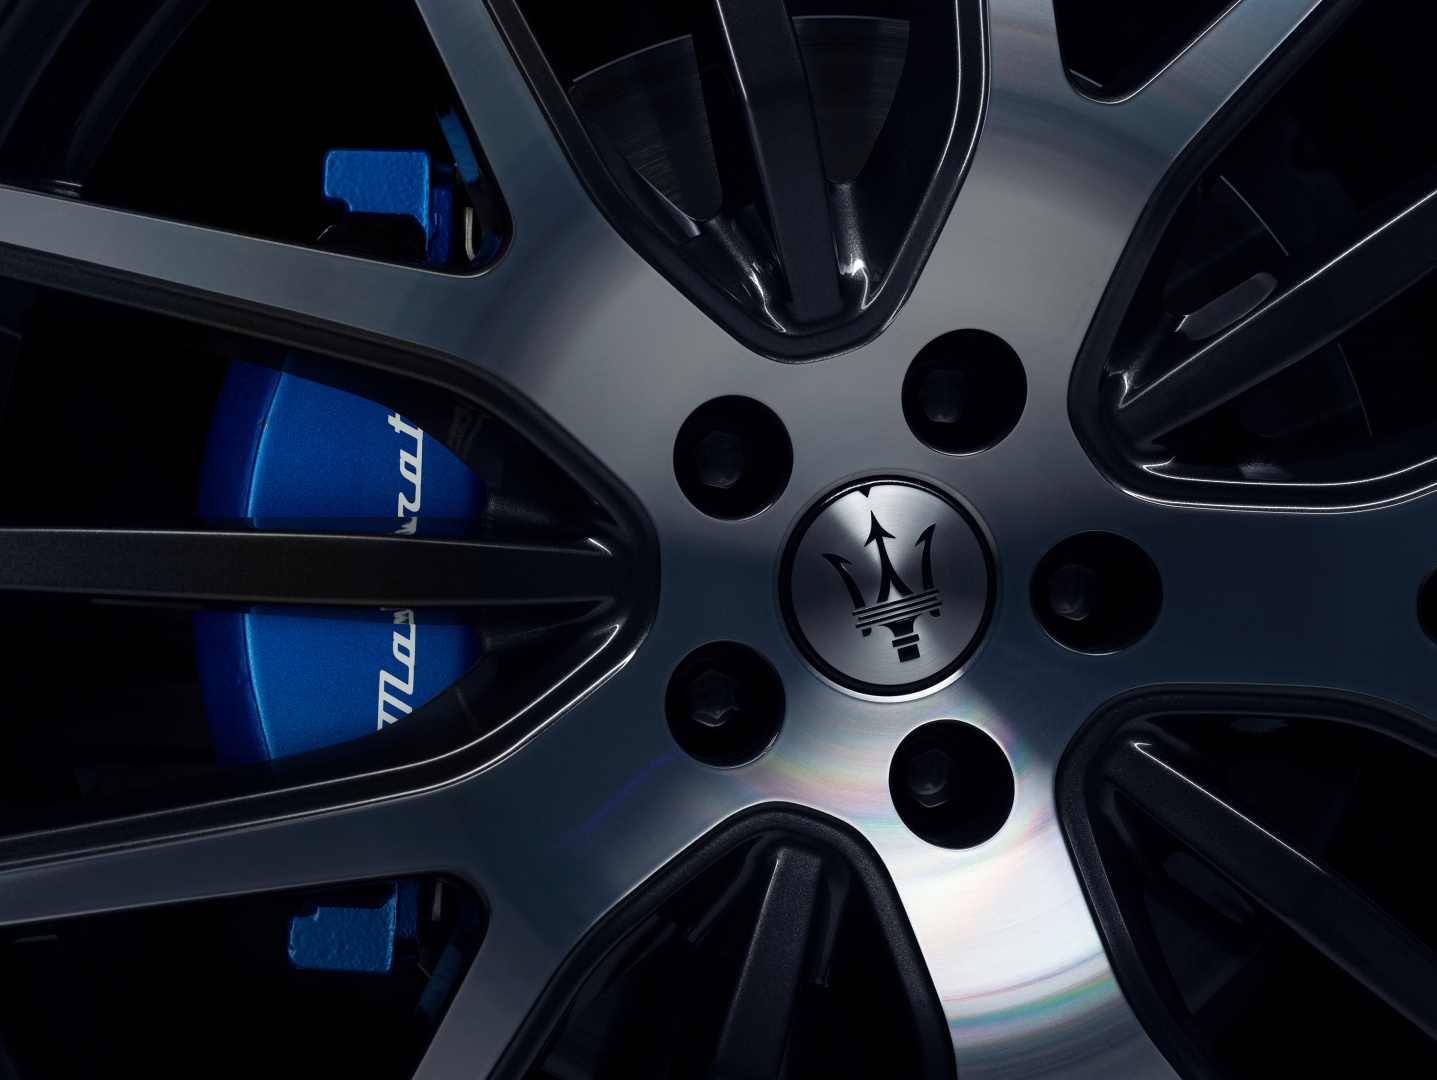 SMALL_17921-MaseratiLevanteHybrid